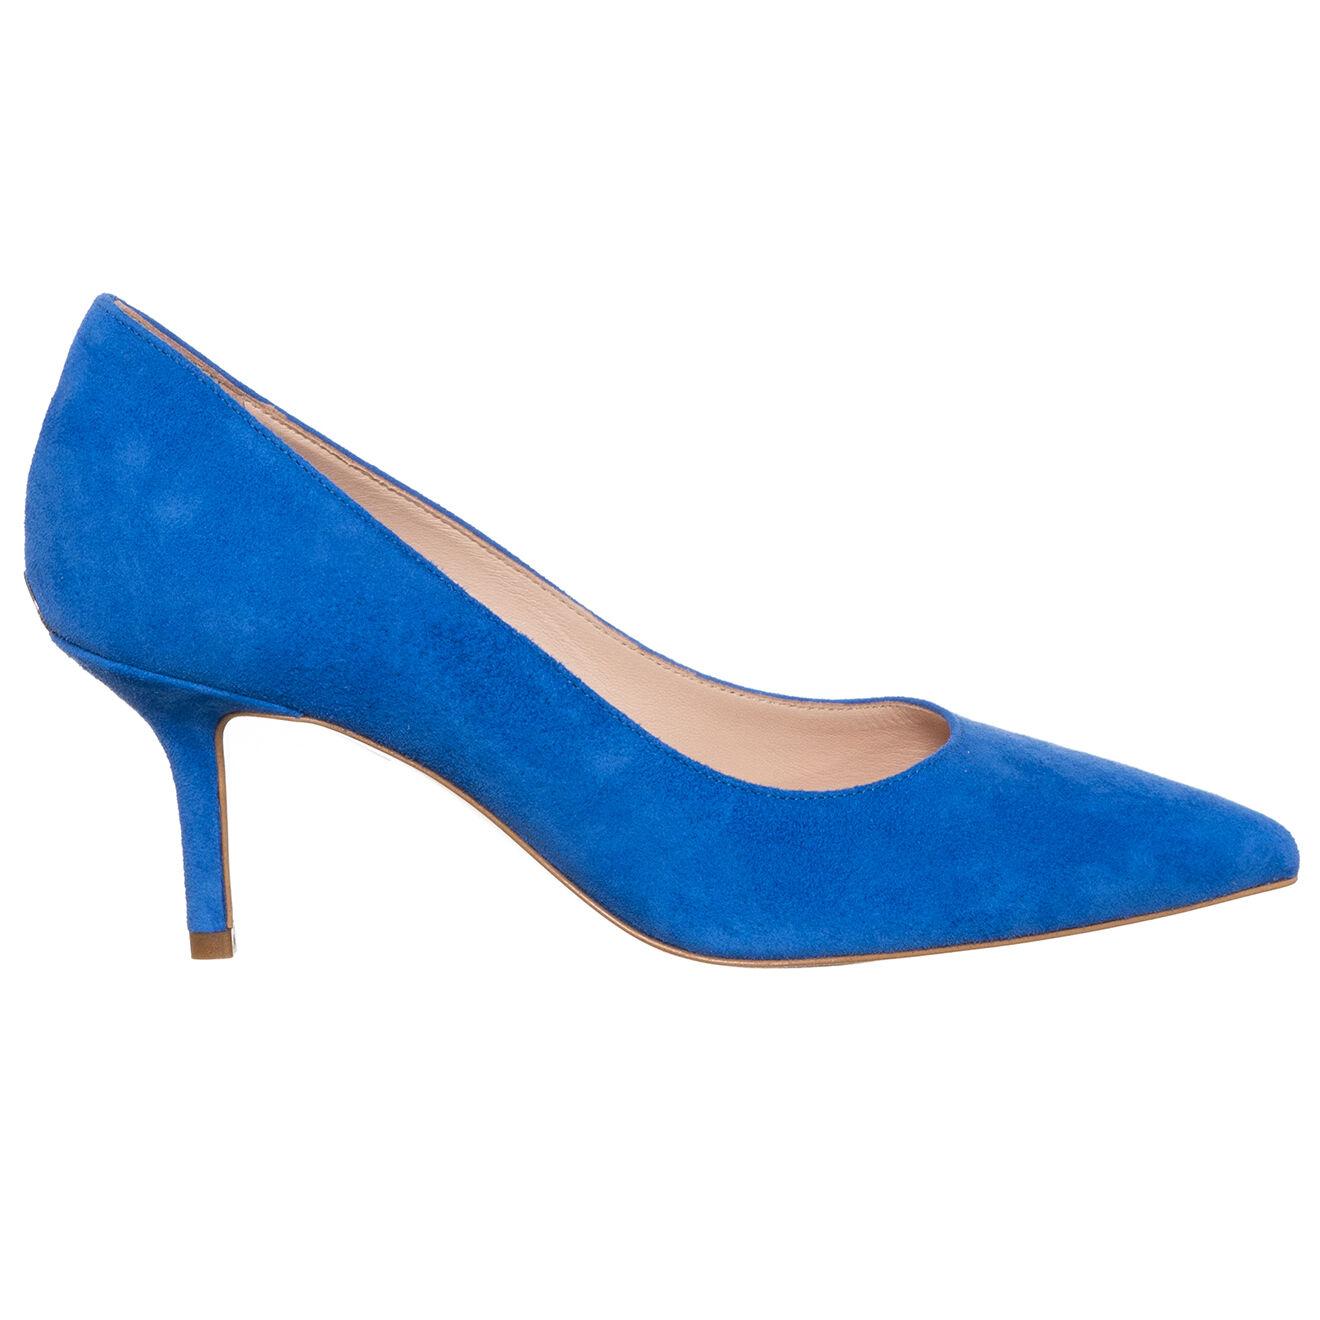 Escarpins en Velours de Cuir Audrey bleus - Talon 6 cm - Liu-Jo - Modalova